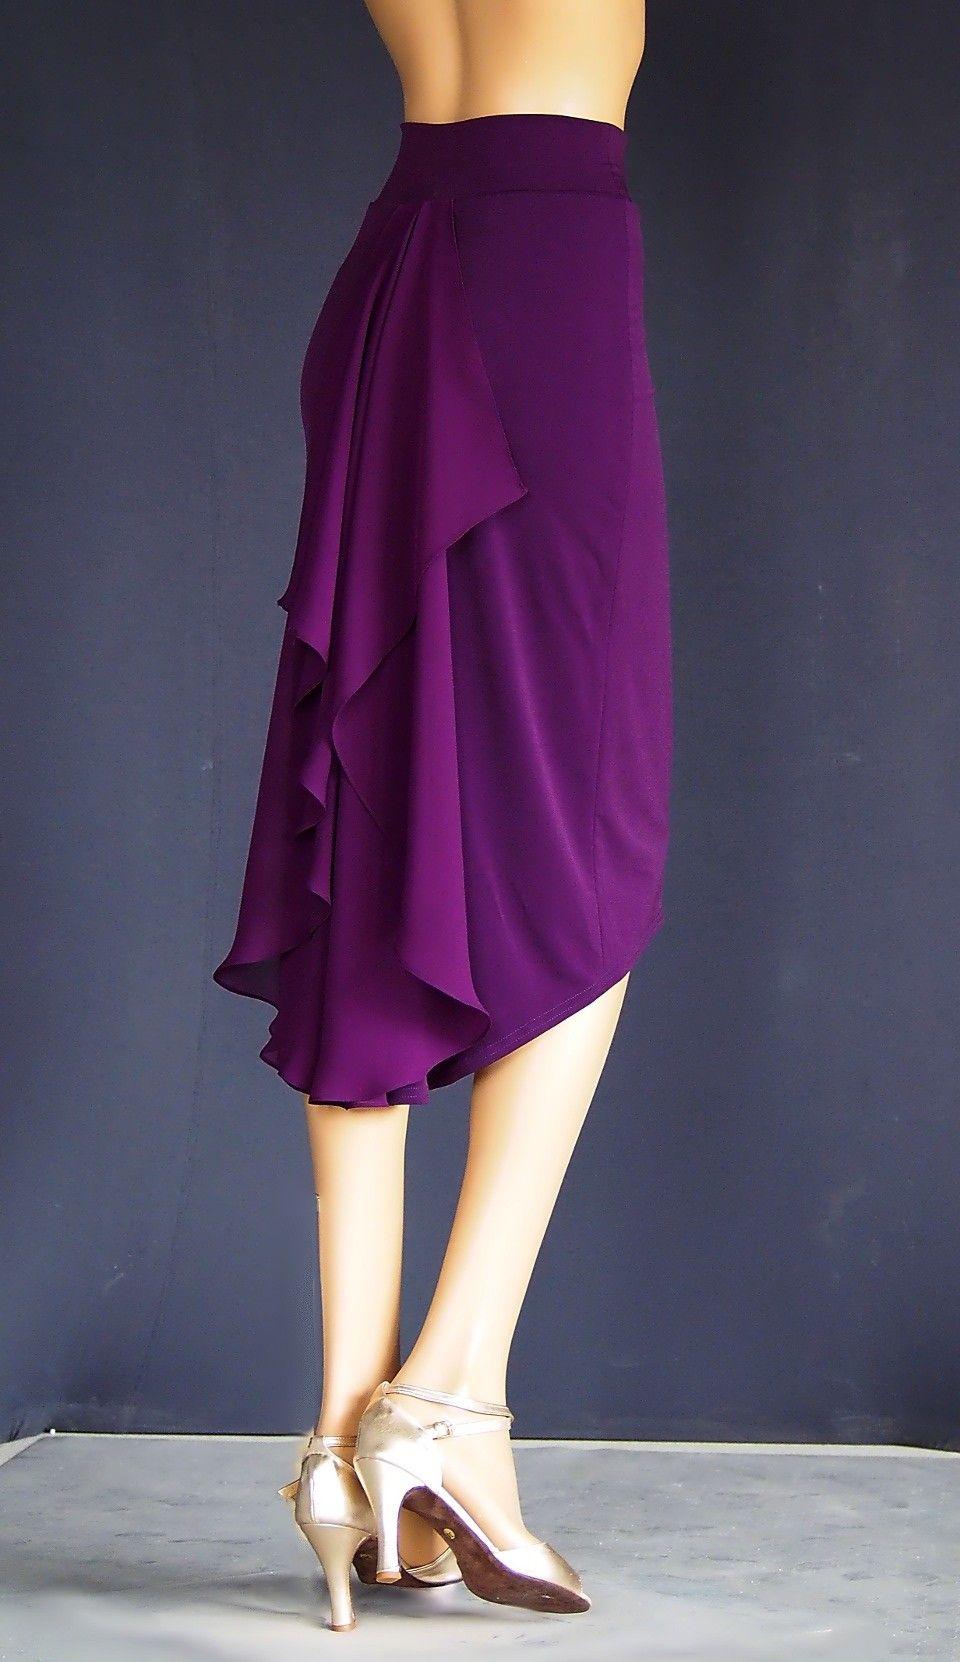 TD-009 tango skirt More | Clothing | Pinterest | Falda, Tango y Costura